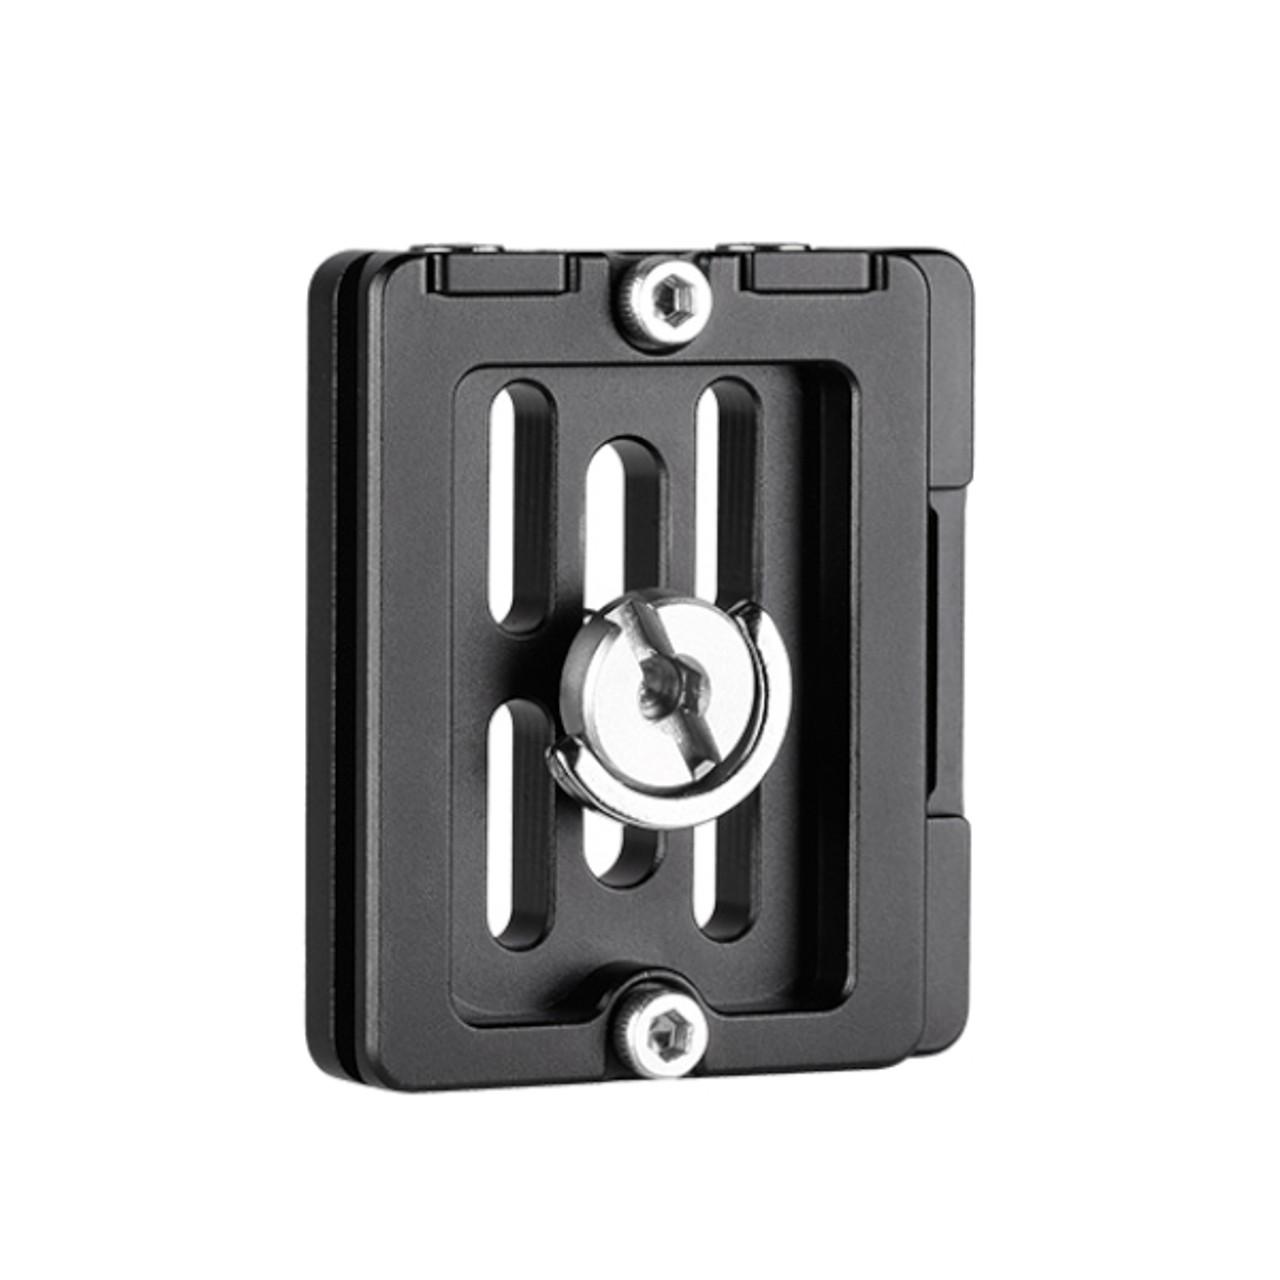 Leofoto NP-50 Adjustable Quick-Release Plate